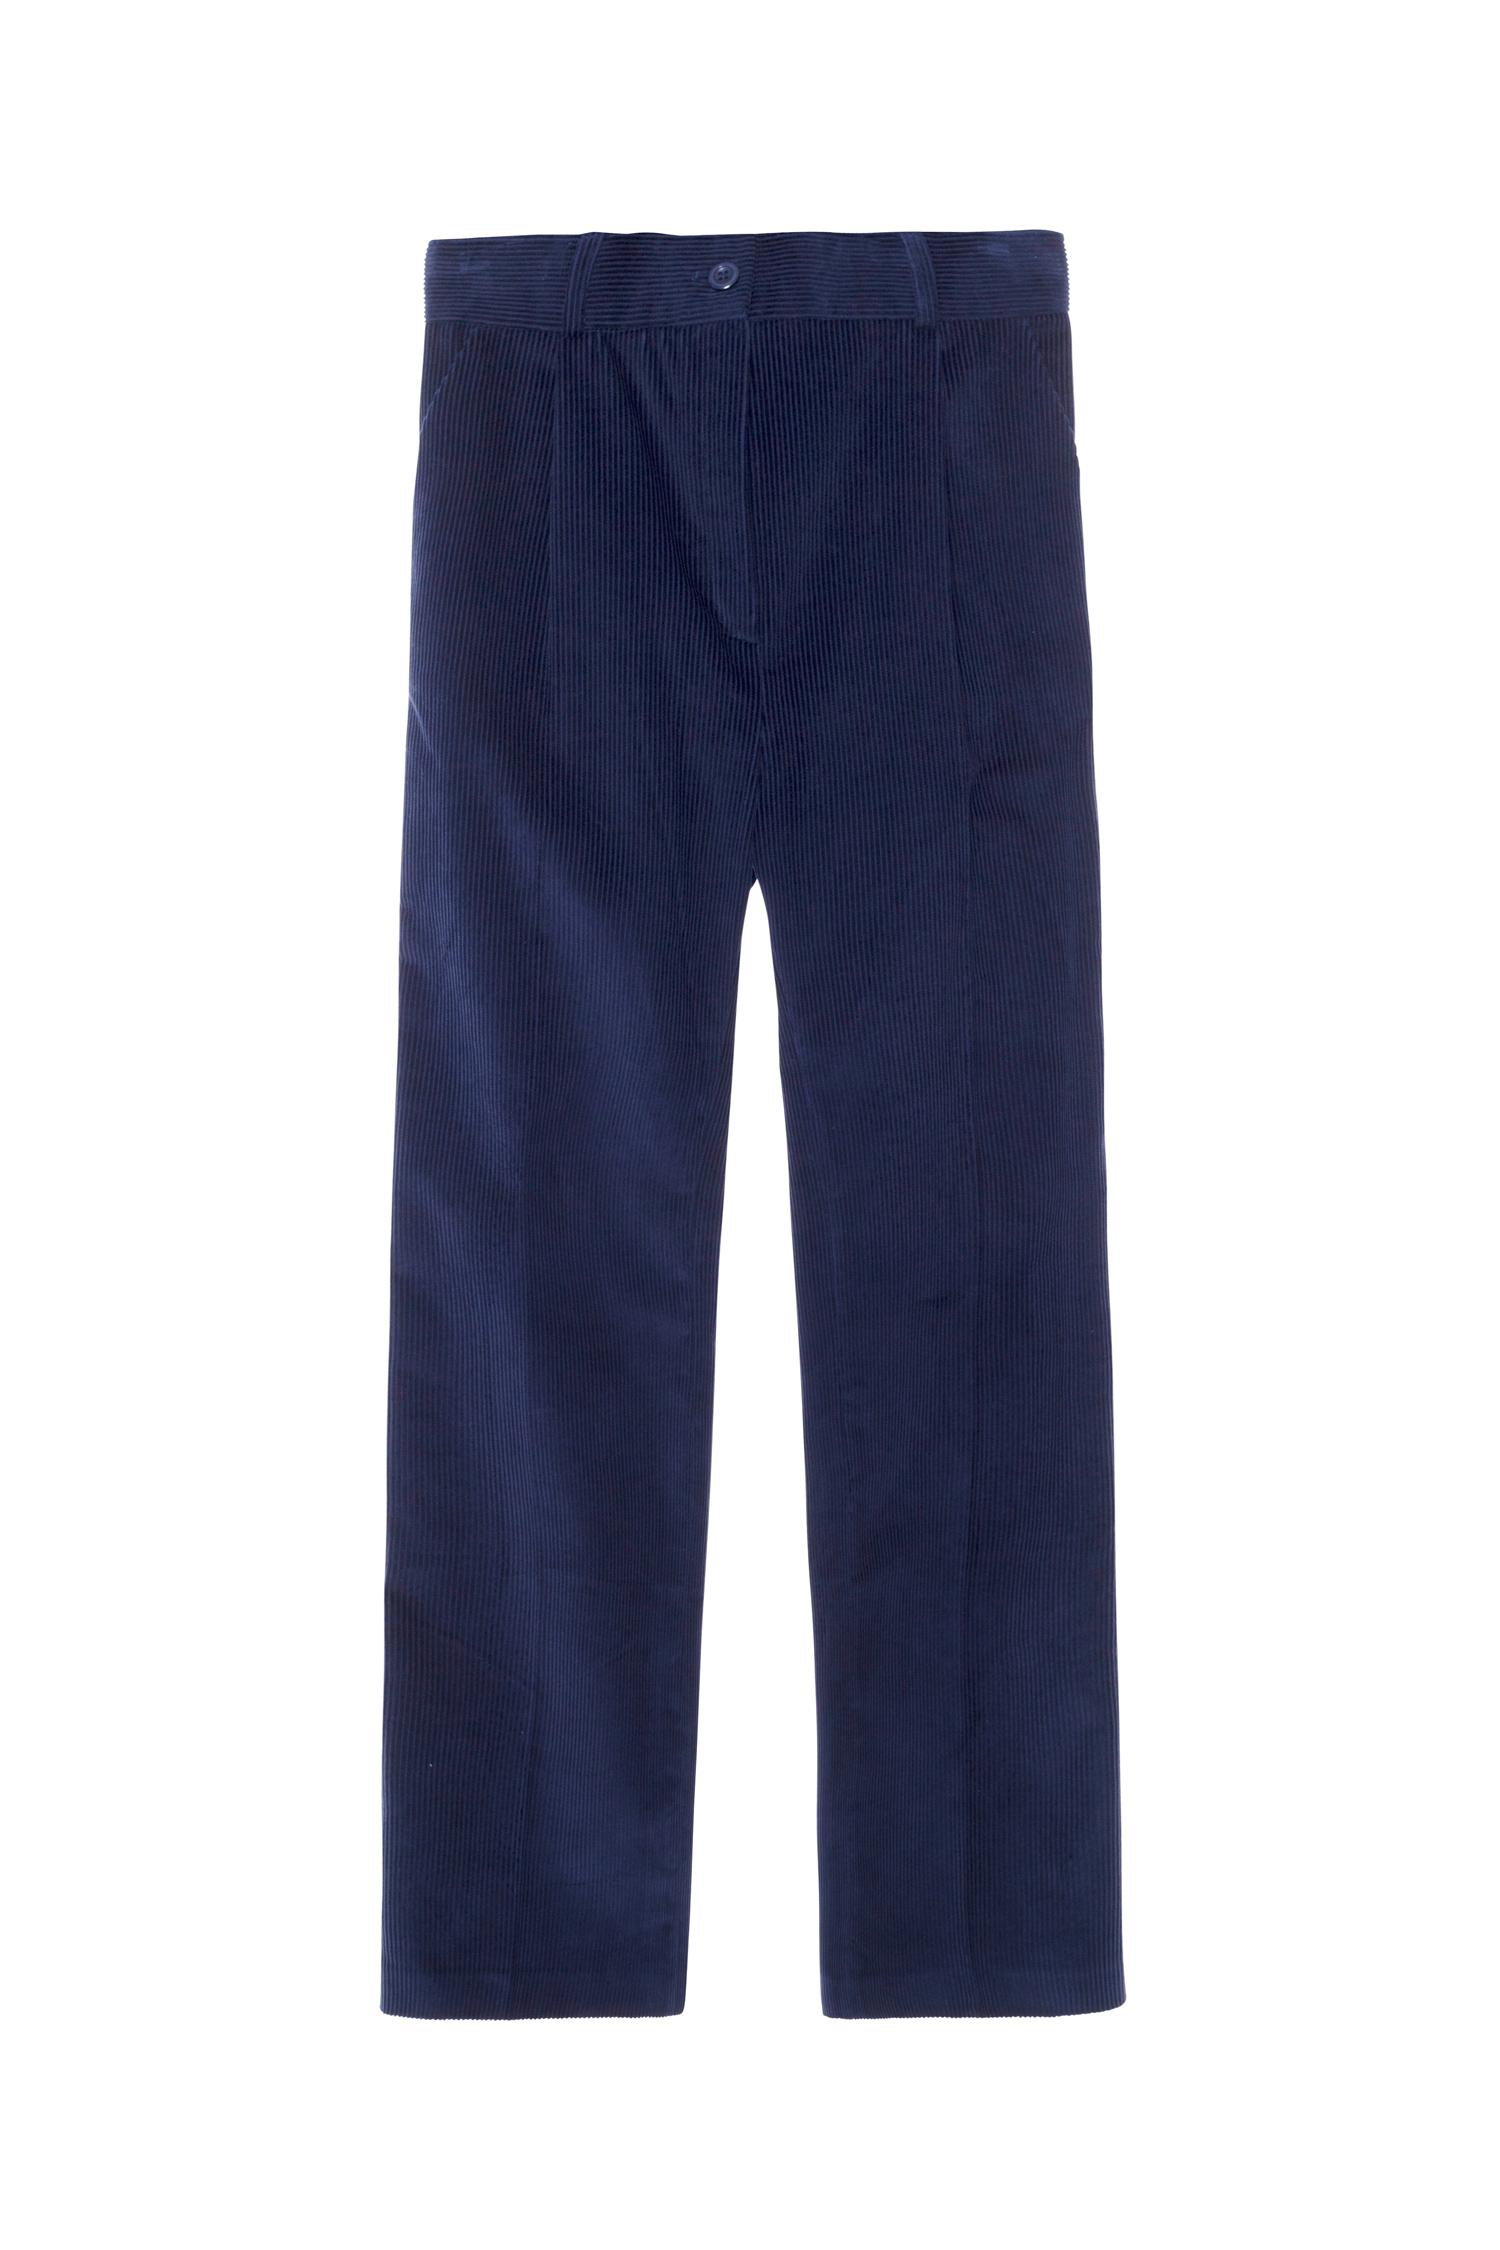 pantalon pana marino